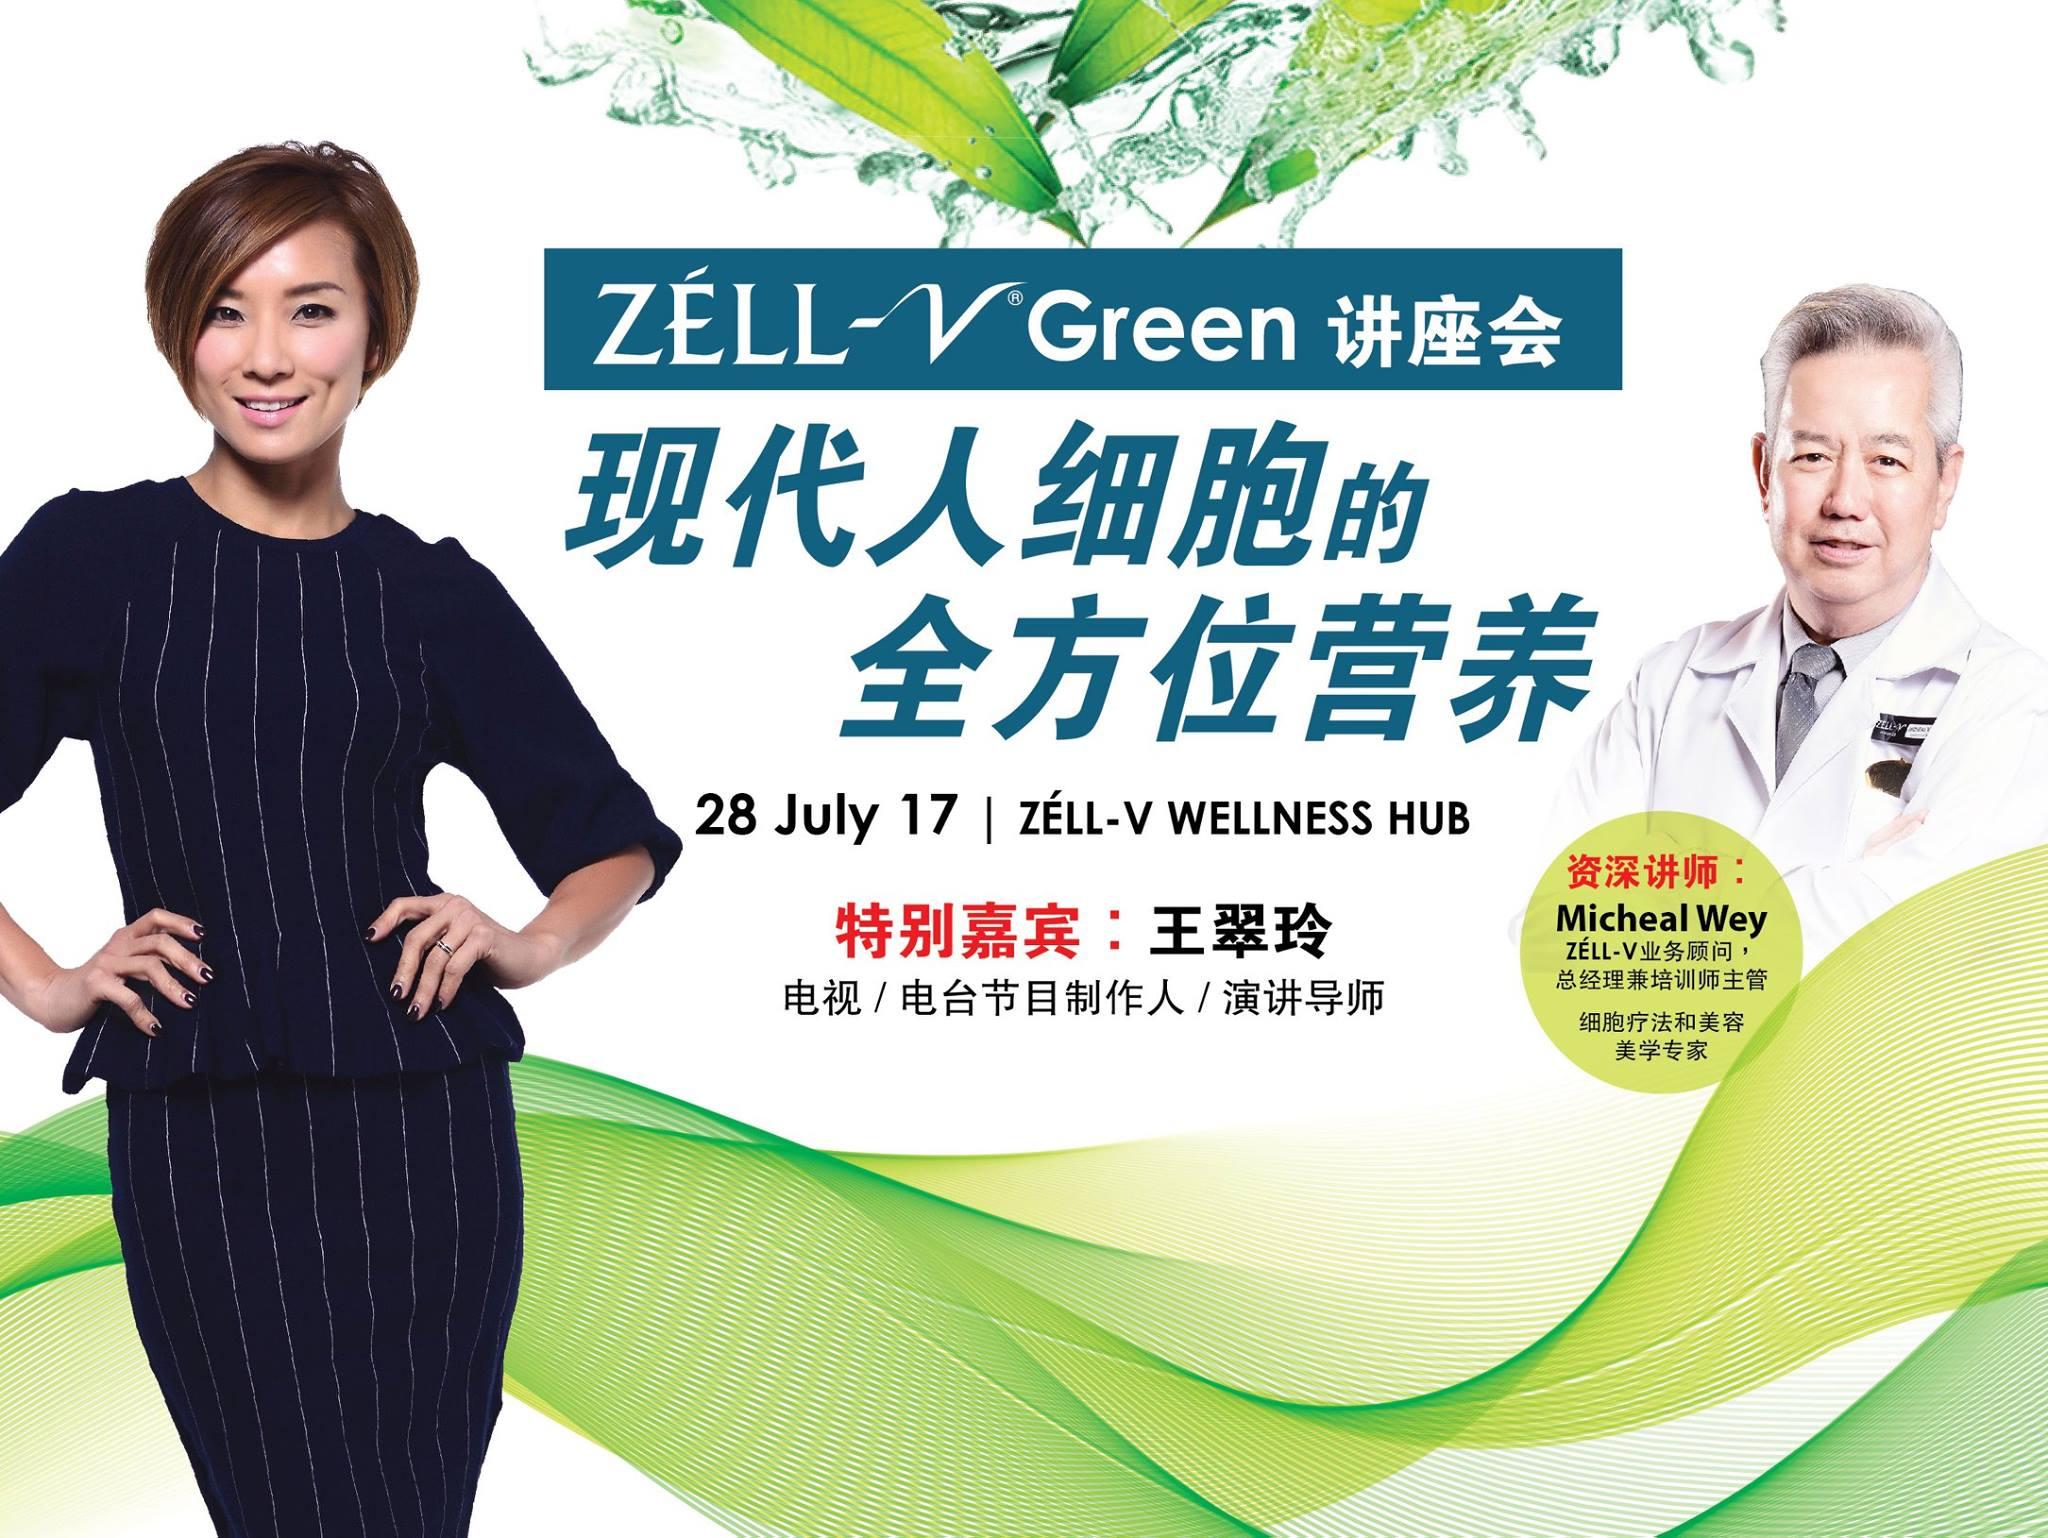 ZÉLL-V Green Seminar @ ZÉLL-V Wellness Hub